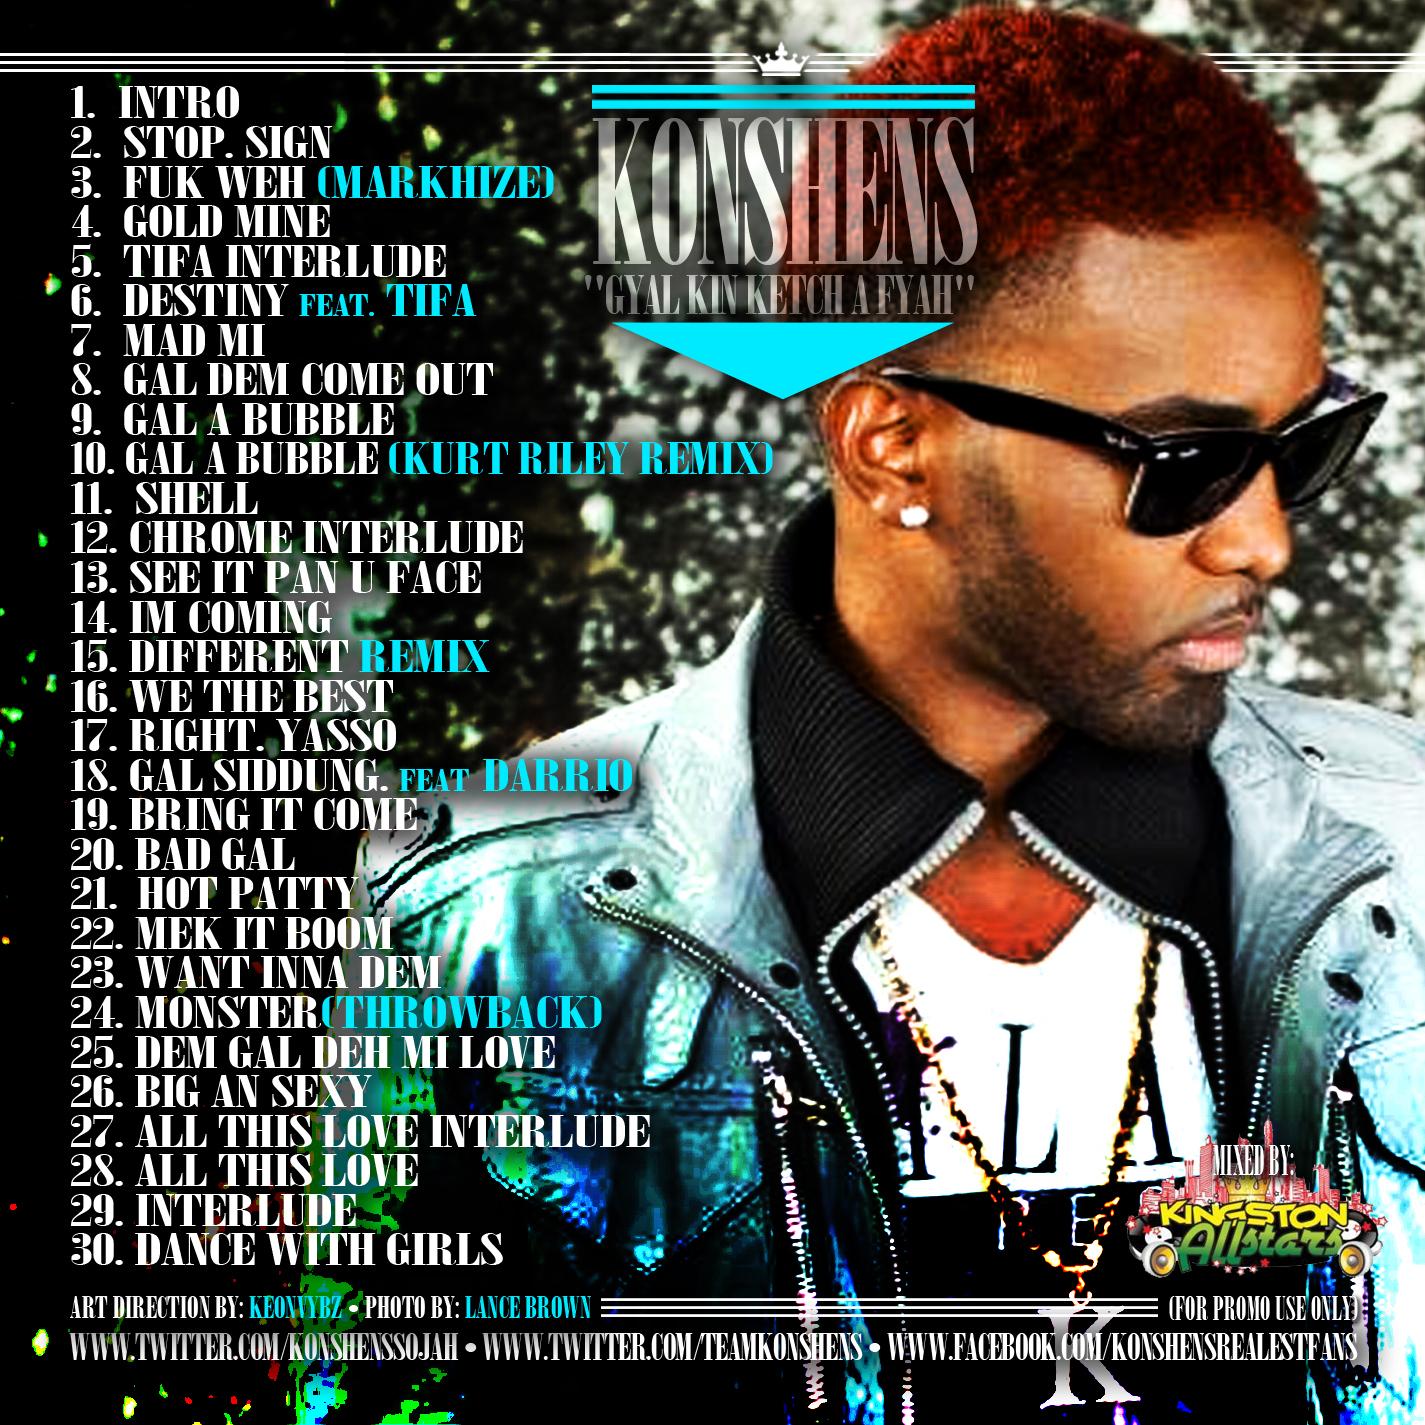 CD_COVER_BK-Gyal+Kin+Ketch+A+Fyah+Mixtap